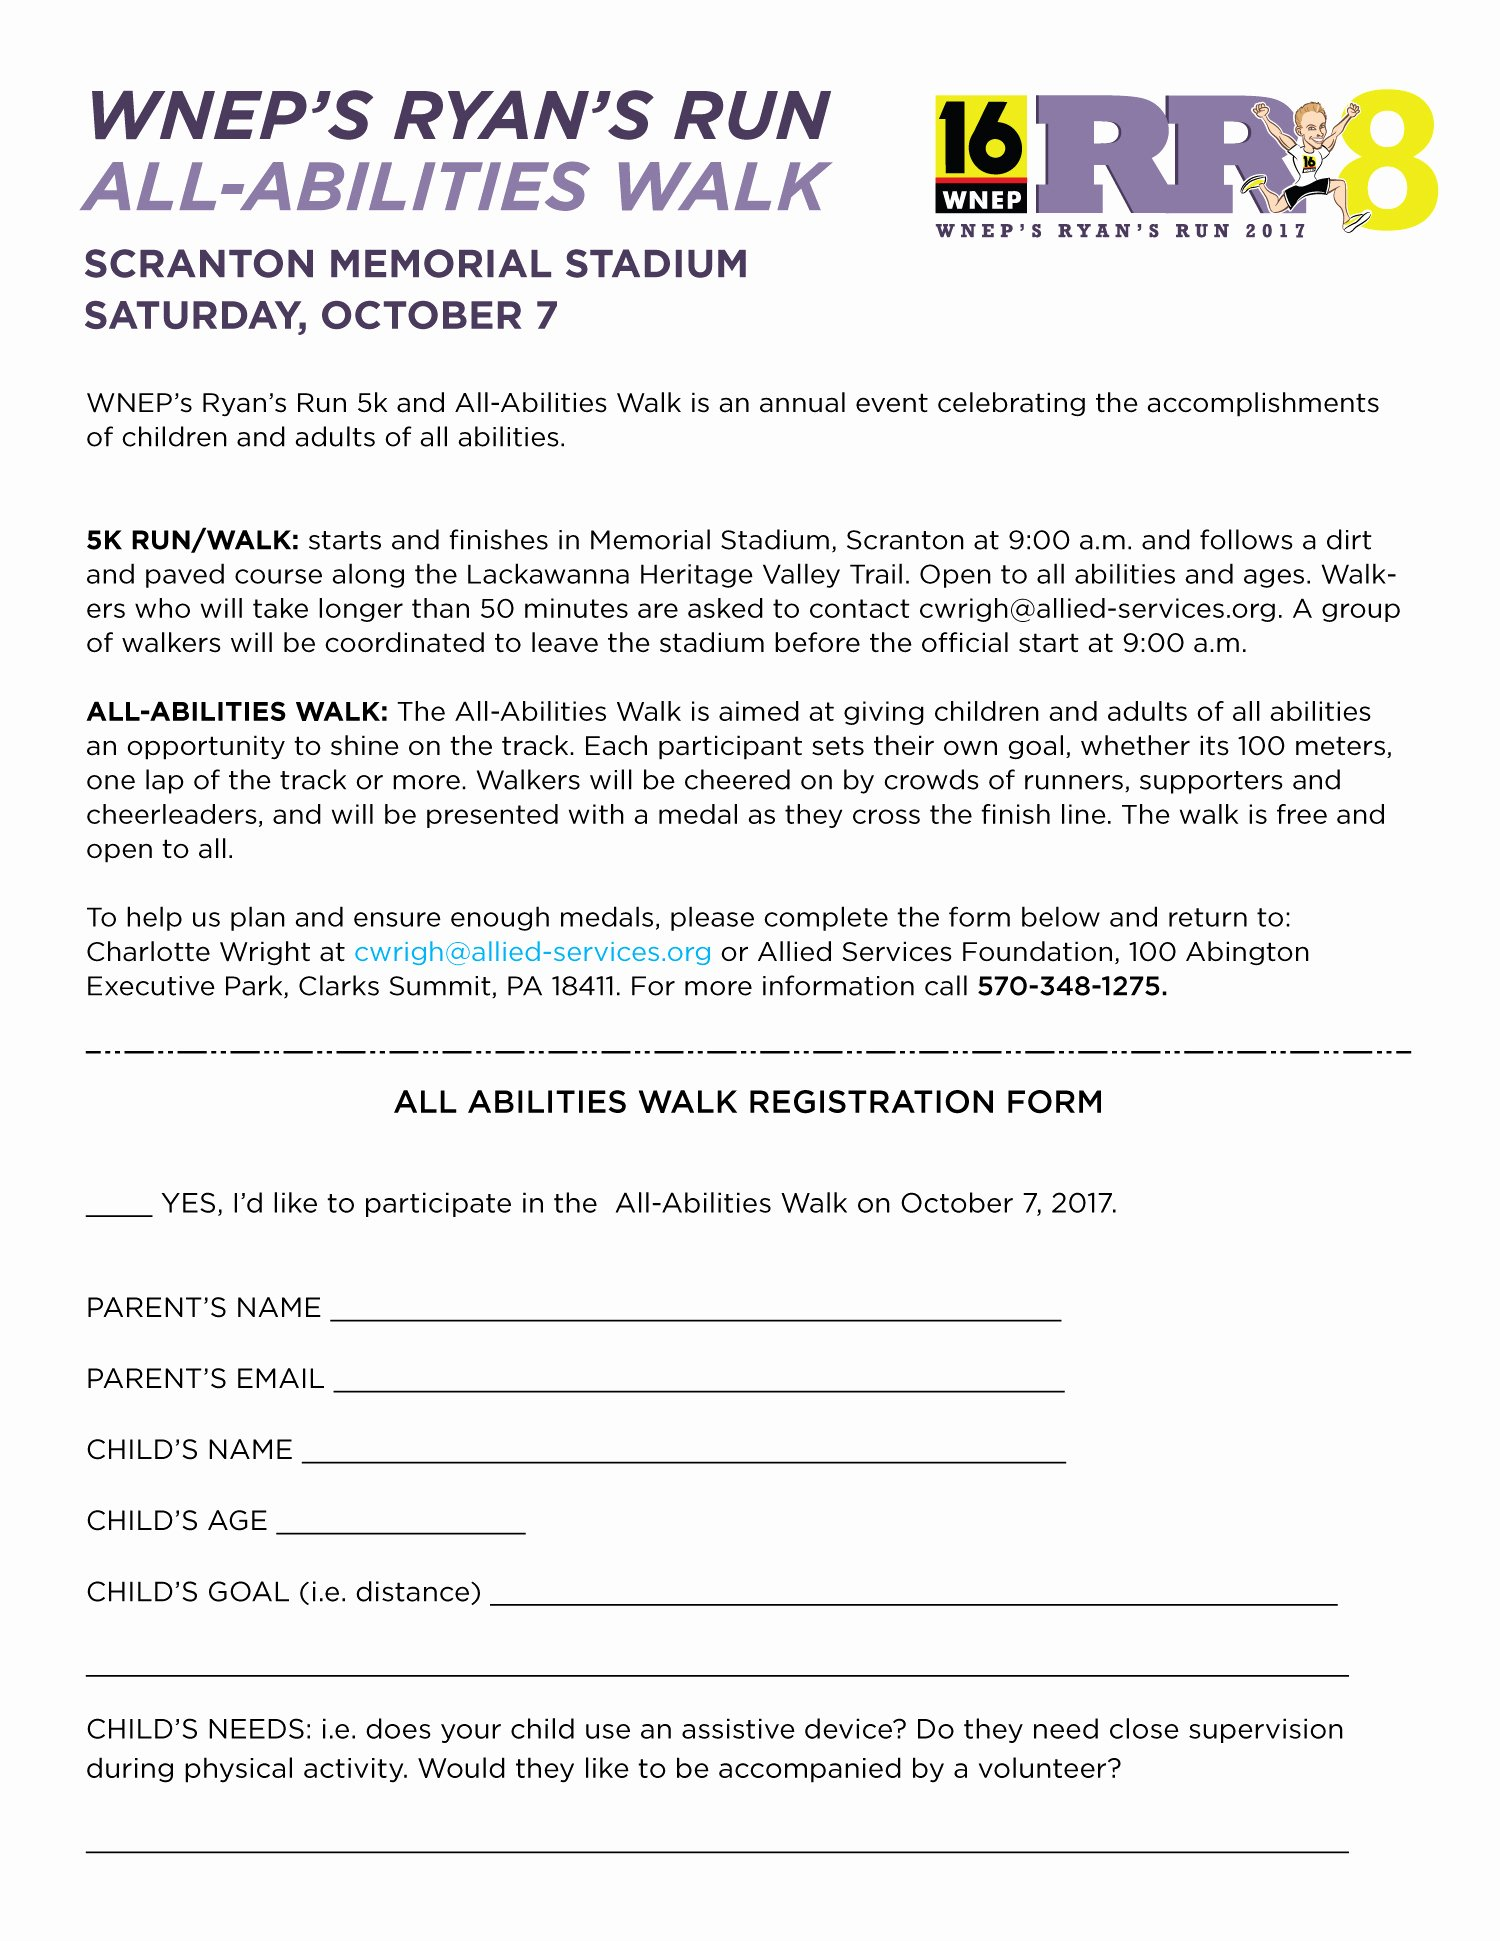 5k Registration form Template Elegant 5k Registration forms or forms are Available at